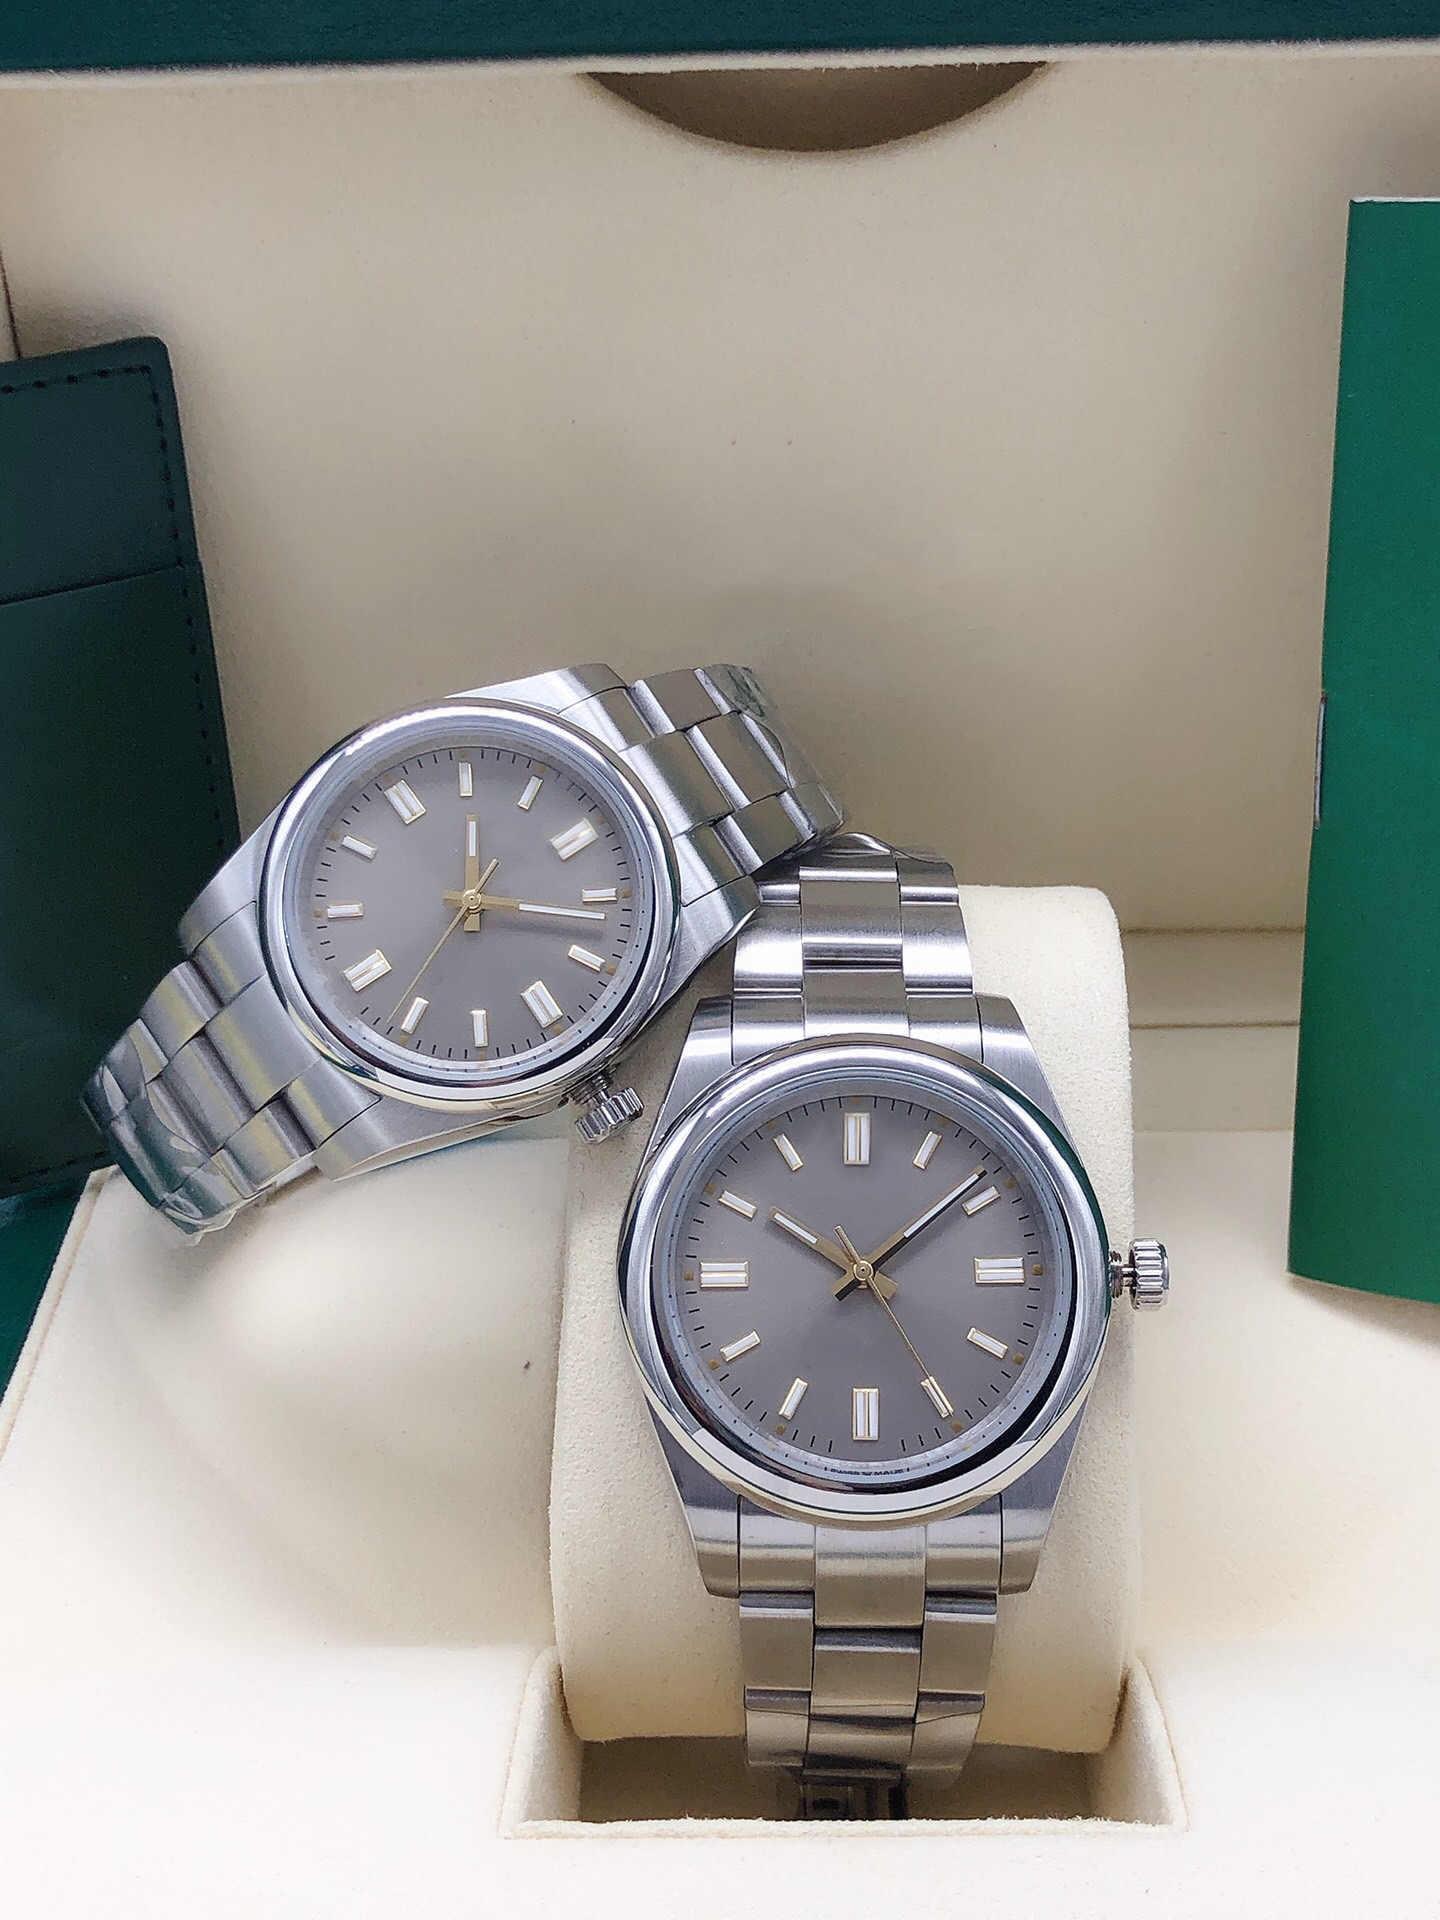 Relógios masculinos 2813 41mm automático relógios de pulso mecânicos Datejust Black Cinza Dial Mens Relógio Completo de Aço Inoxidável Correias Homens Vestido Acessório Masculino relógio de pulso